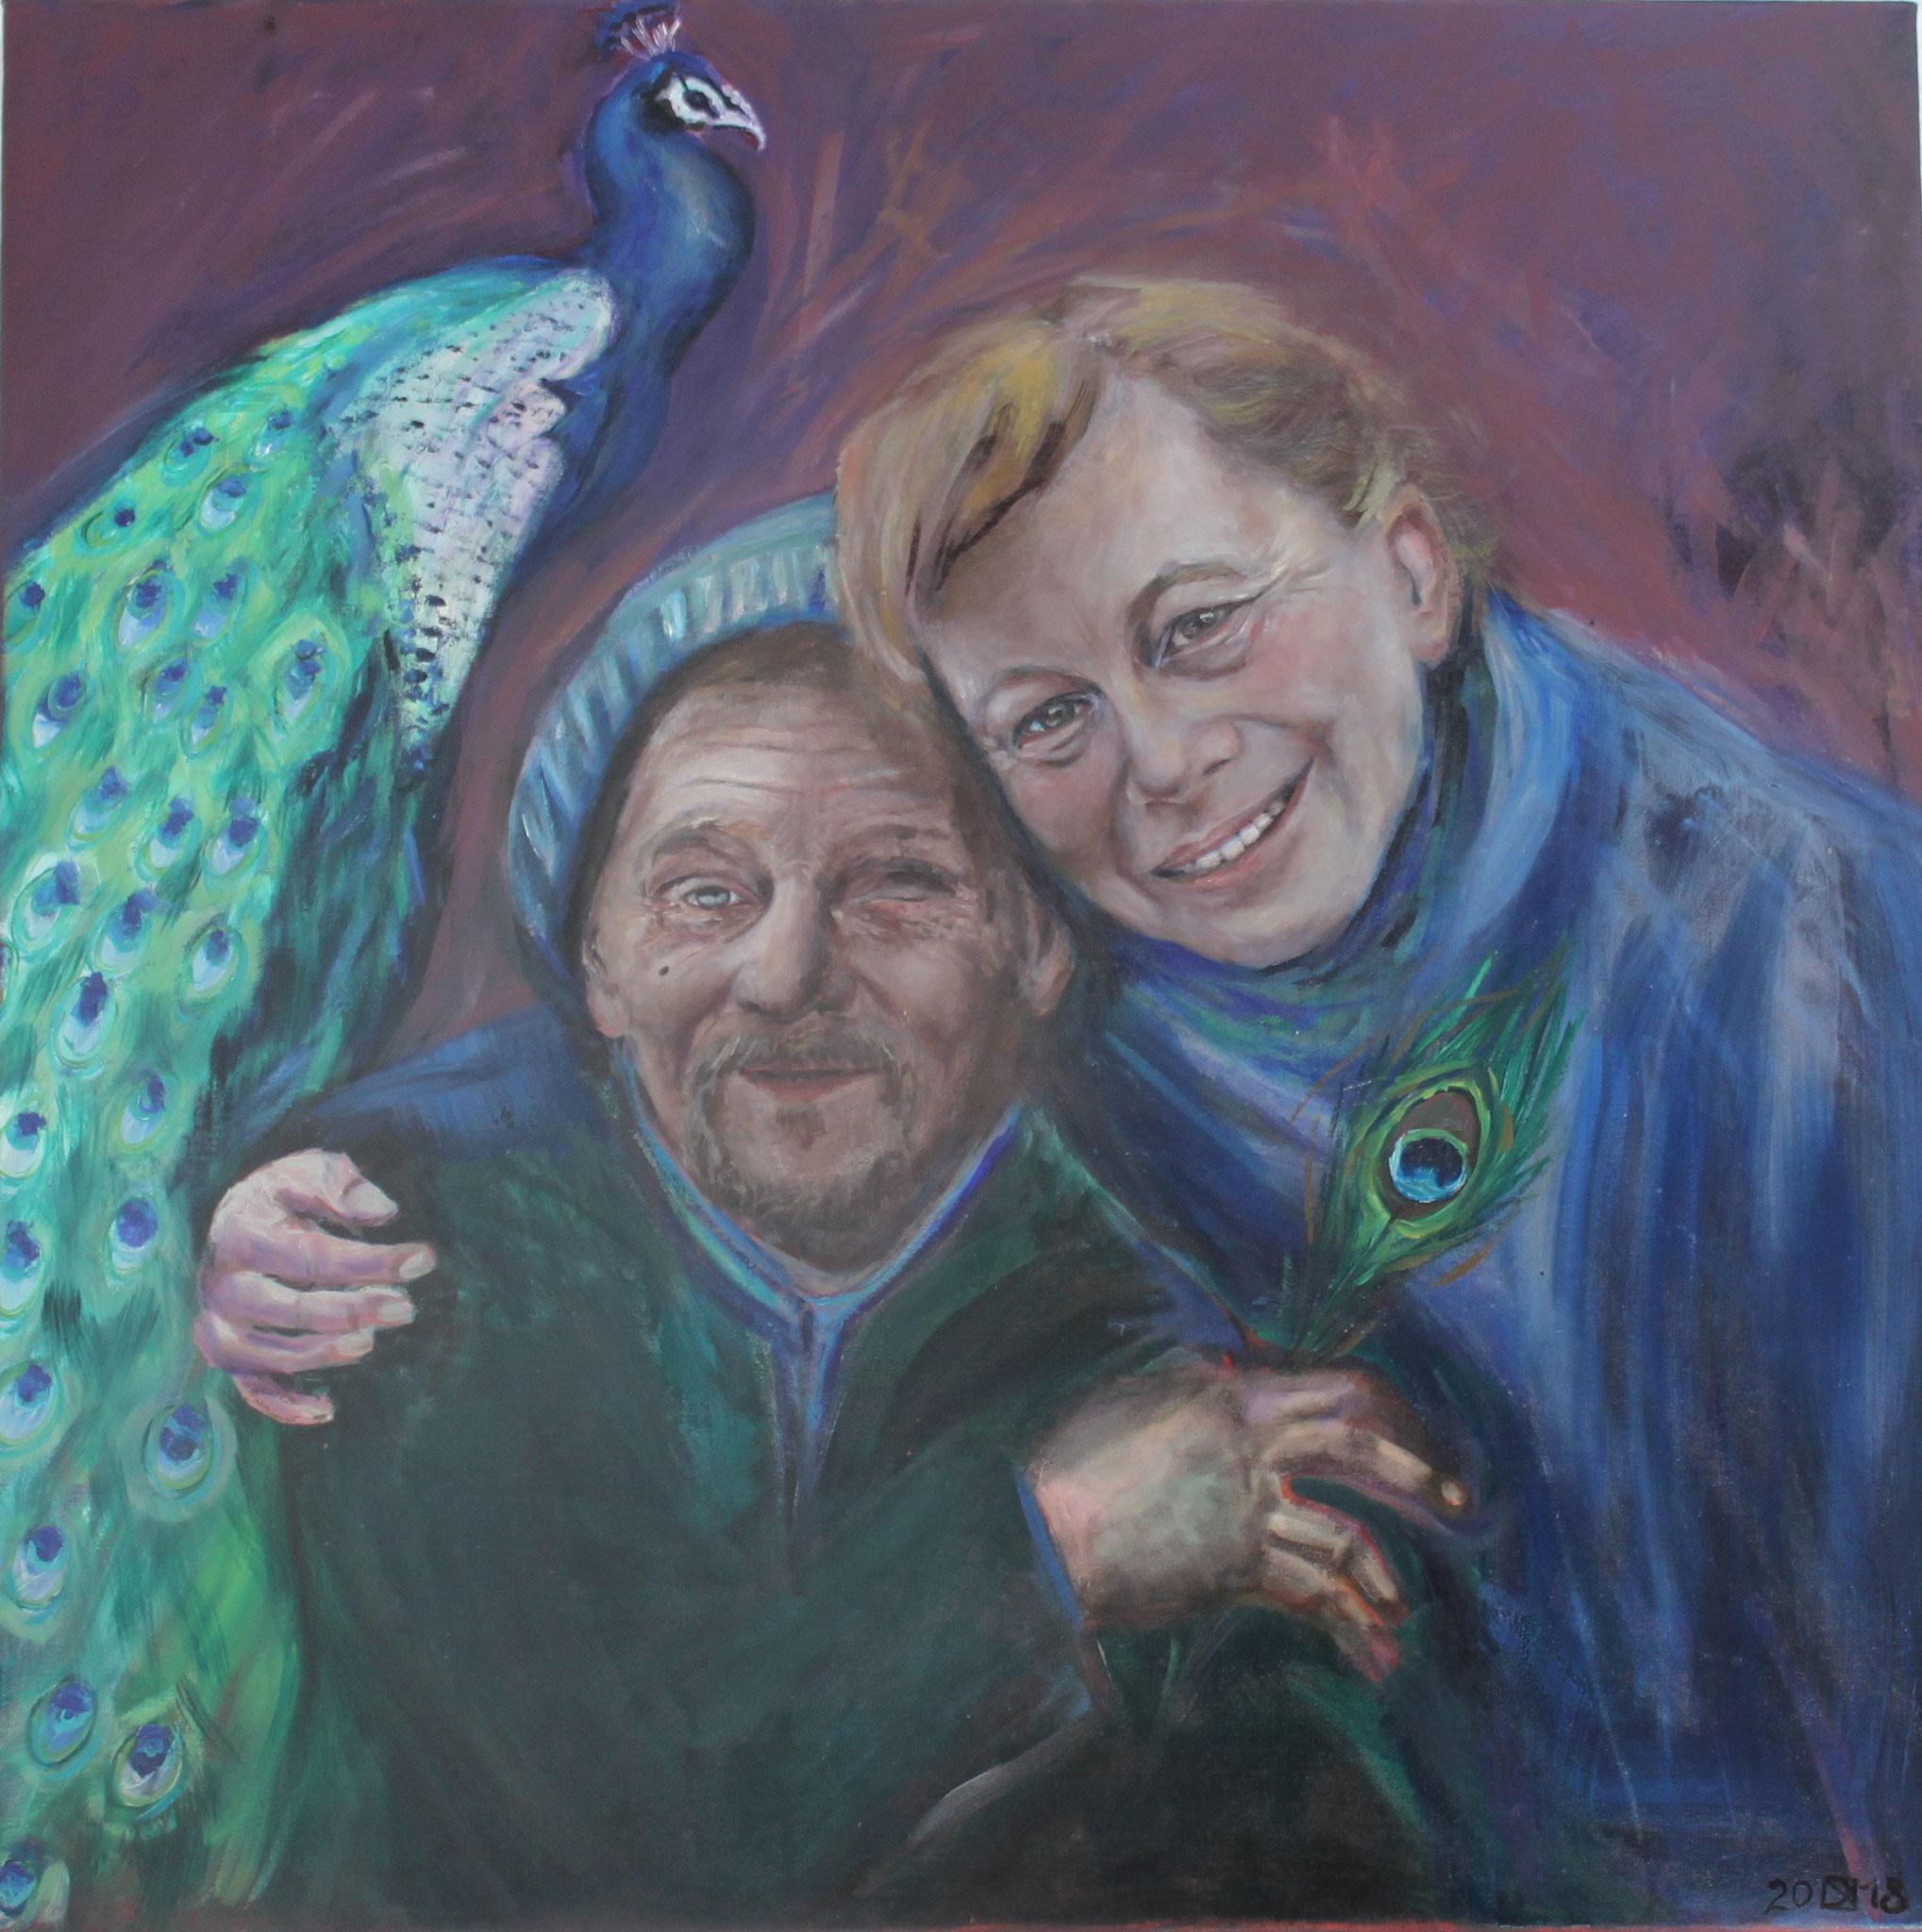 Janek und Nicole, 2018, Öl auf Leinwand, 80 cm x 80 cm x 4 cm